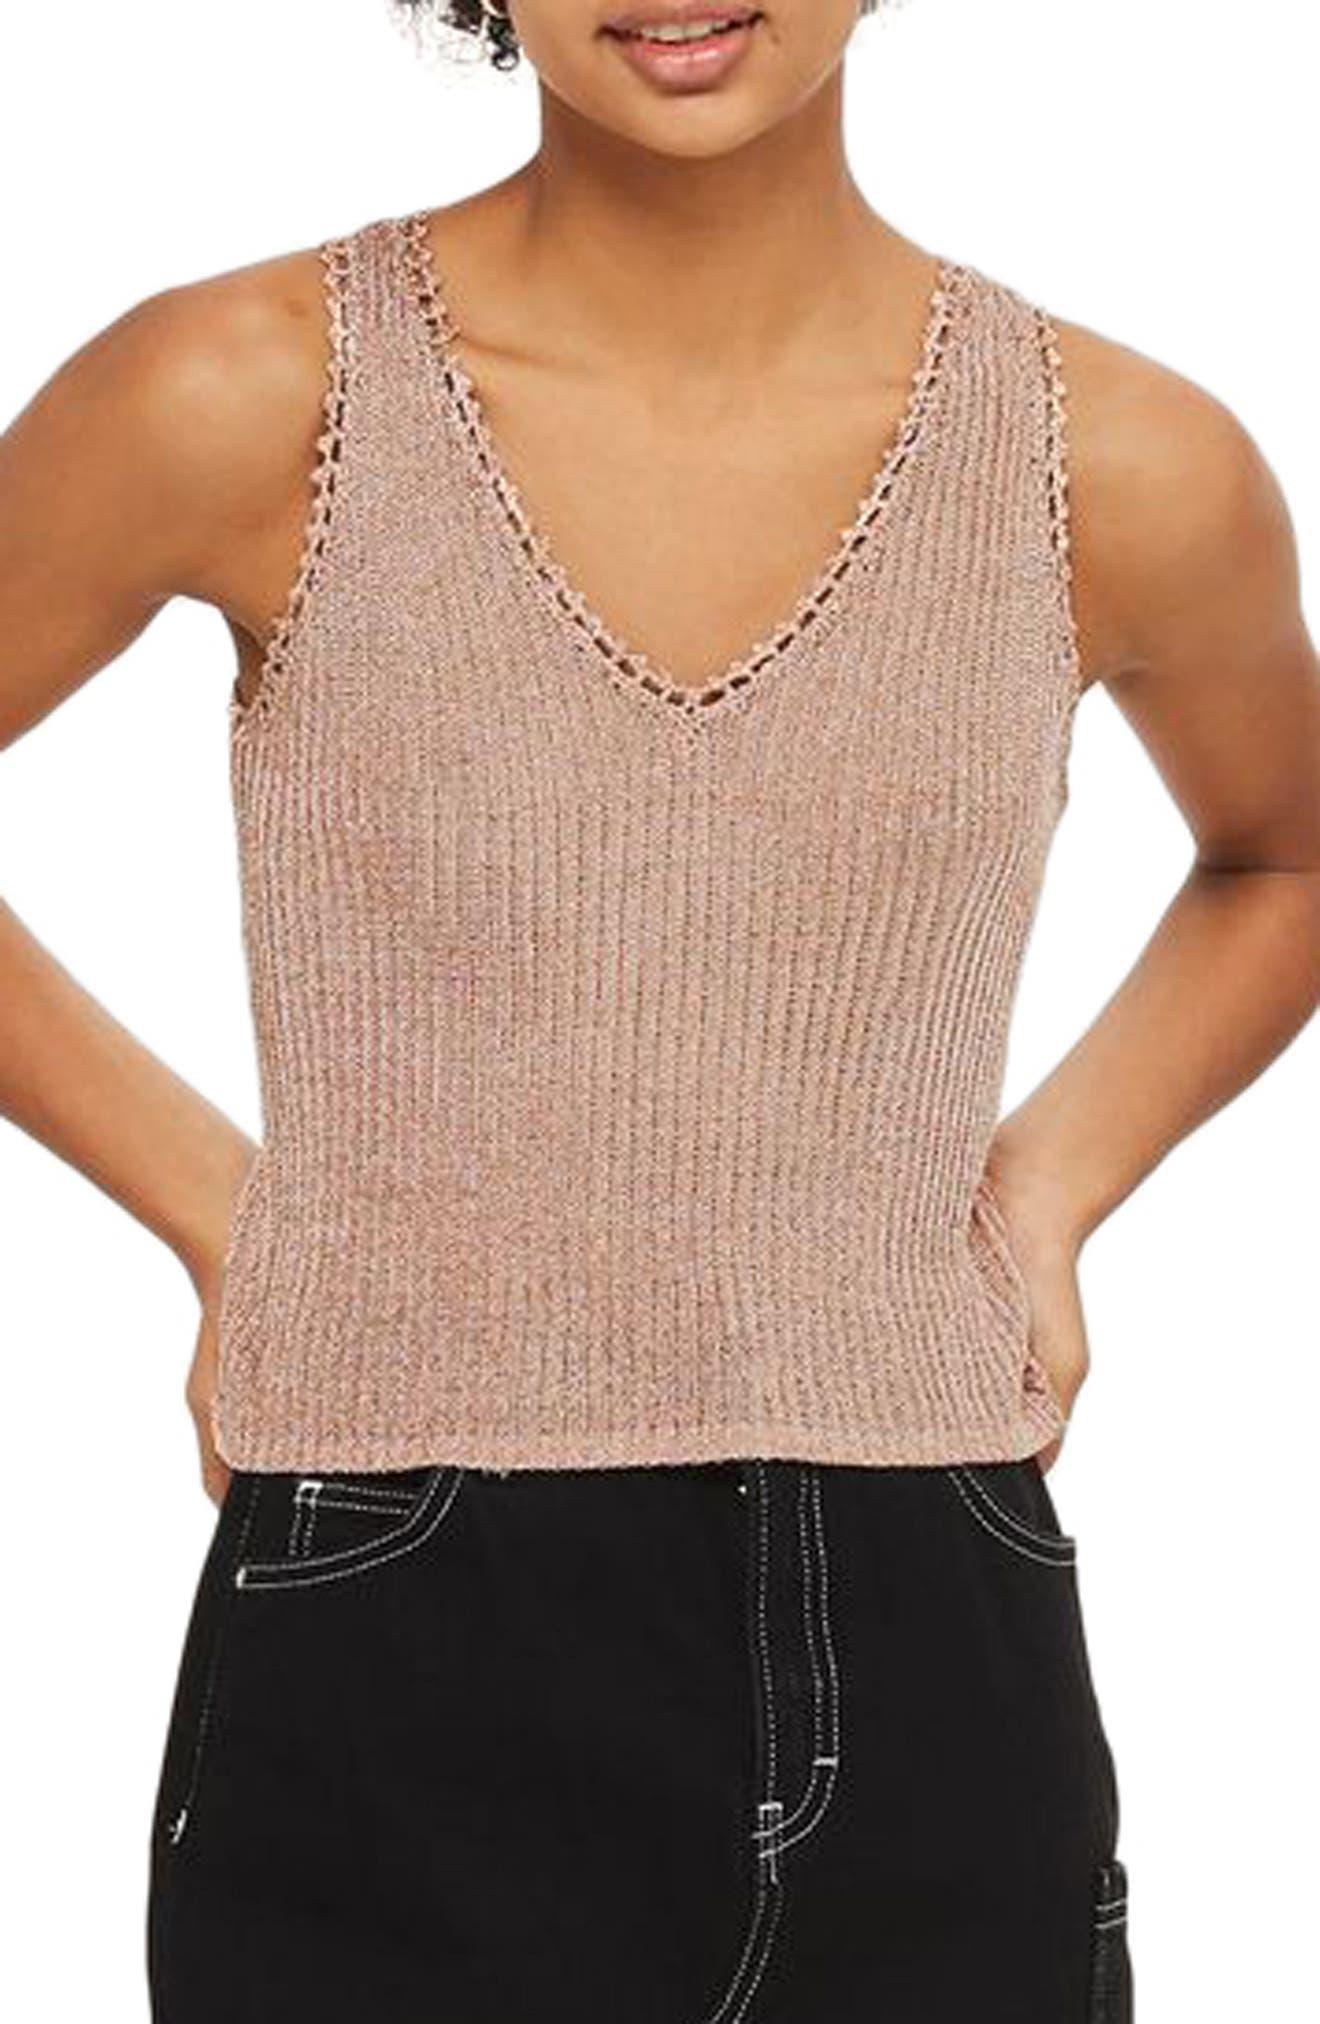 Main Image - Topshop Metallic Ribbed Sweater Tank